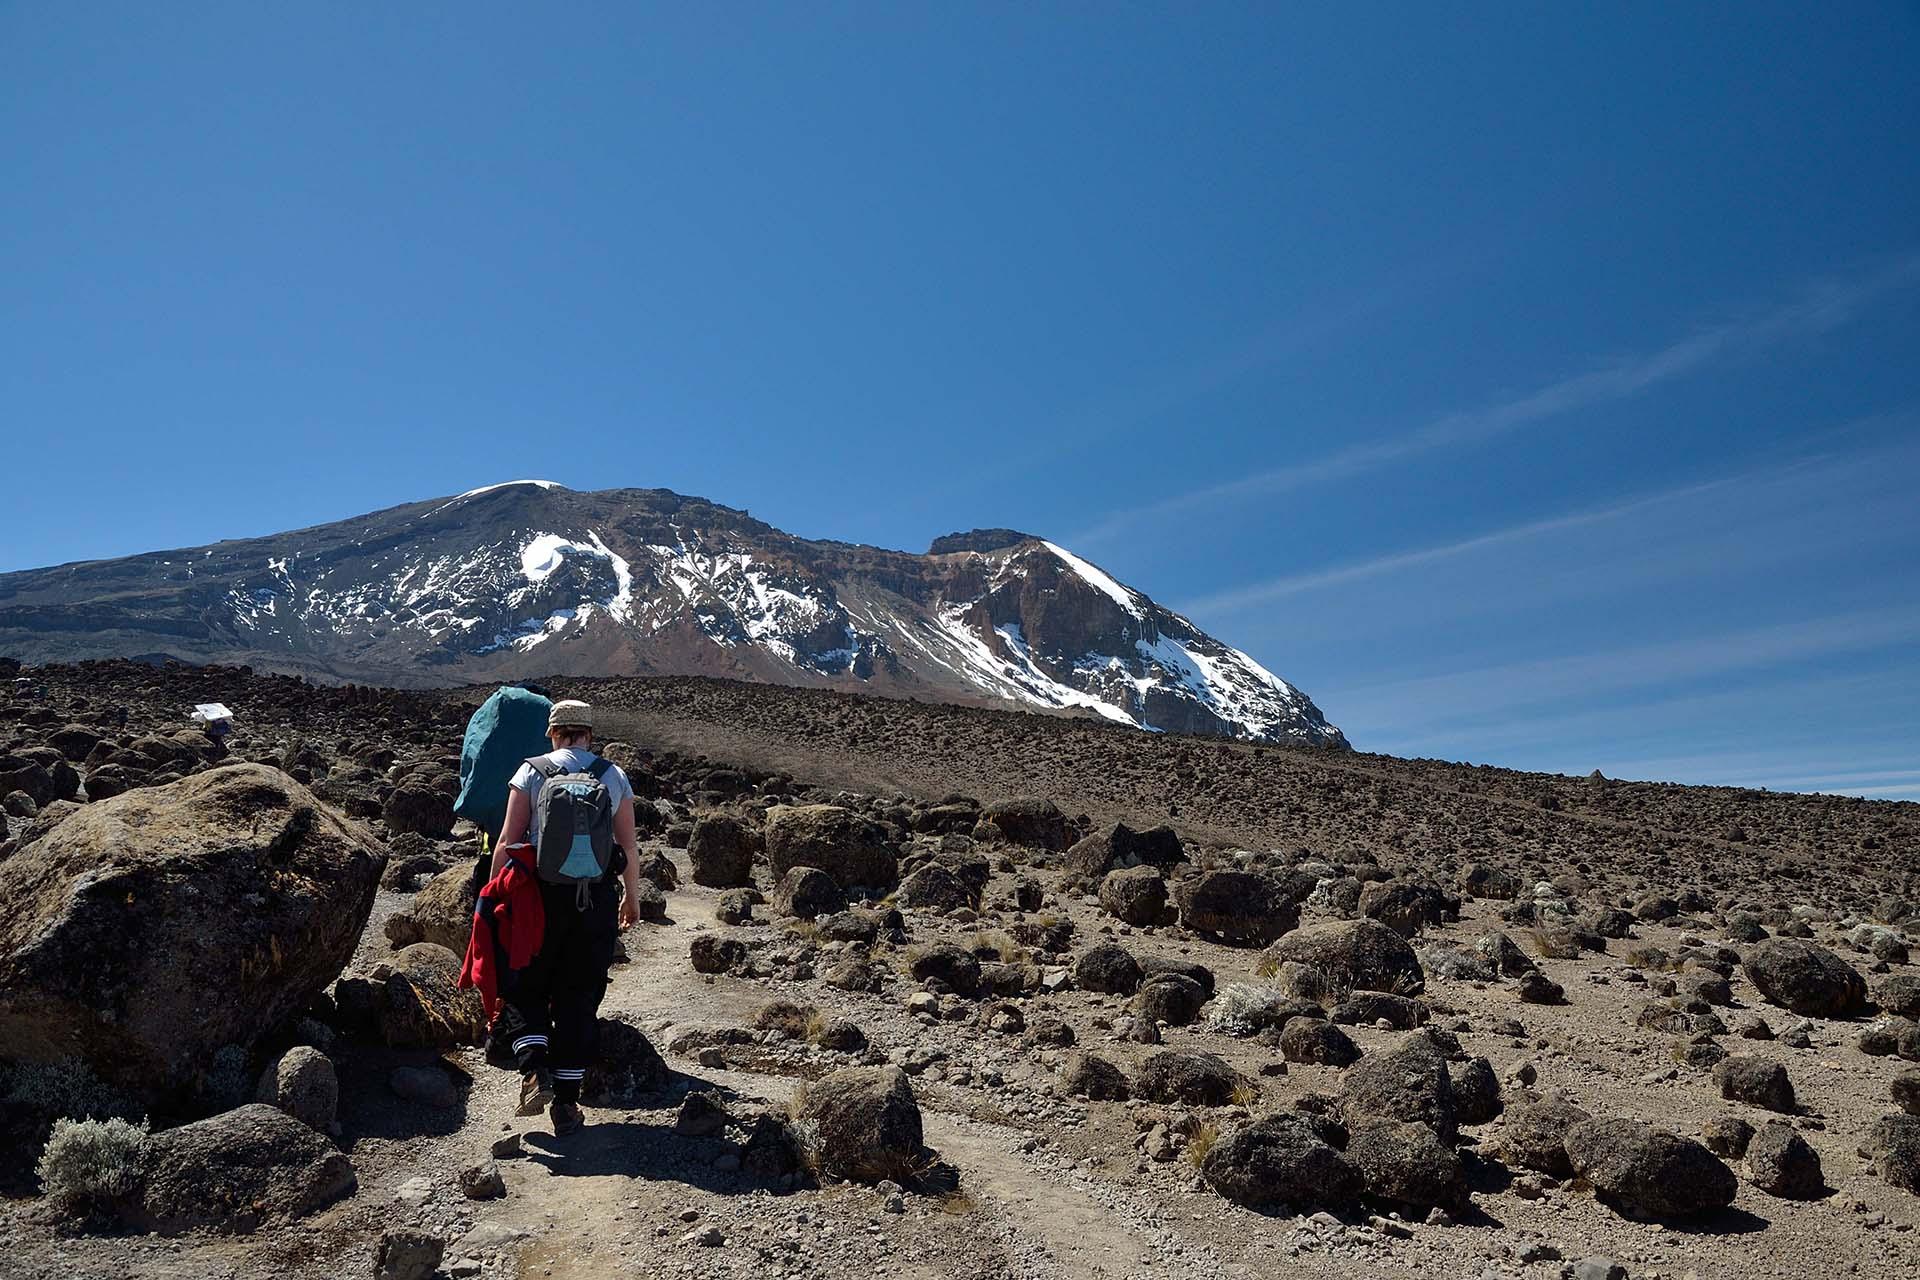 kilimanjaro-challenge-mt-kilimanjaro-trekking-itineraries-maasai-wanderings-tanzania-africa